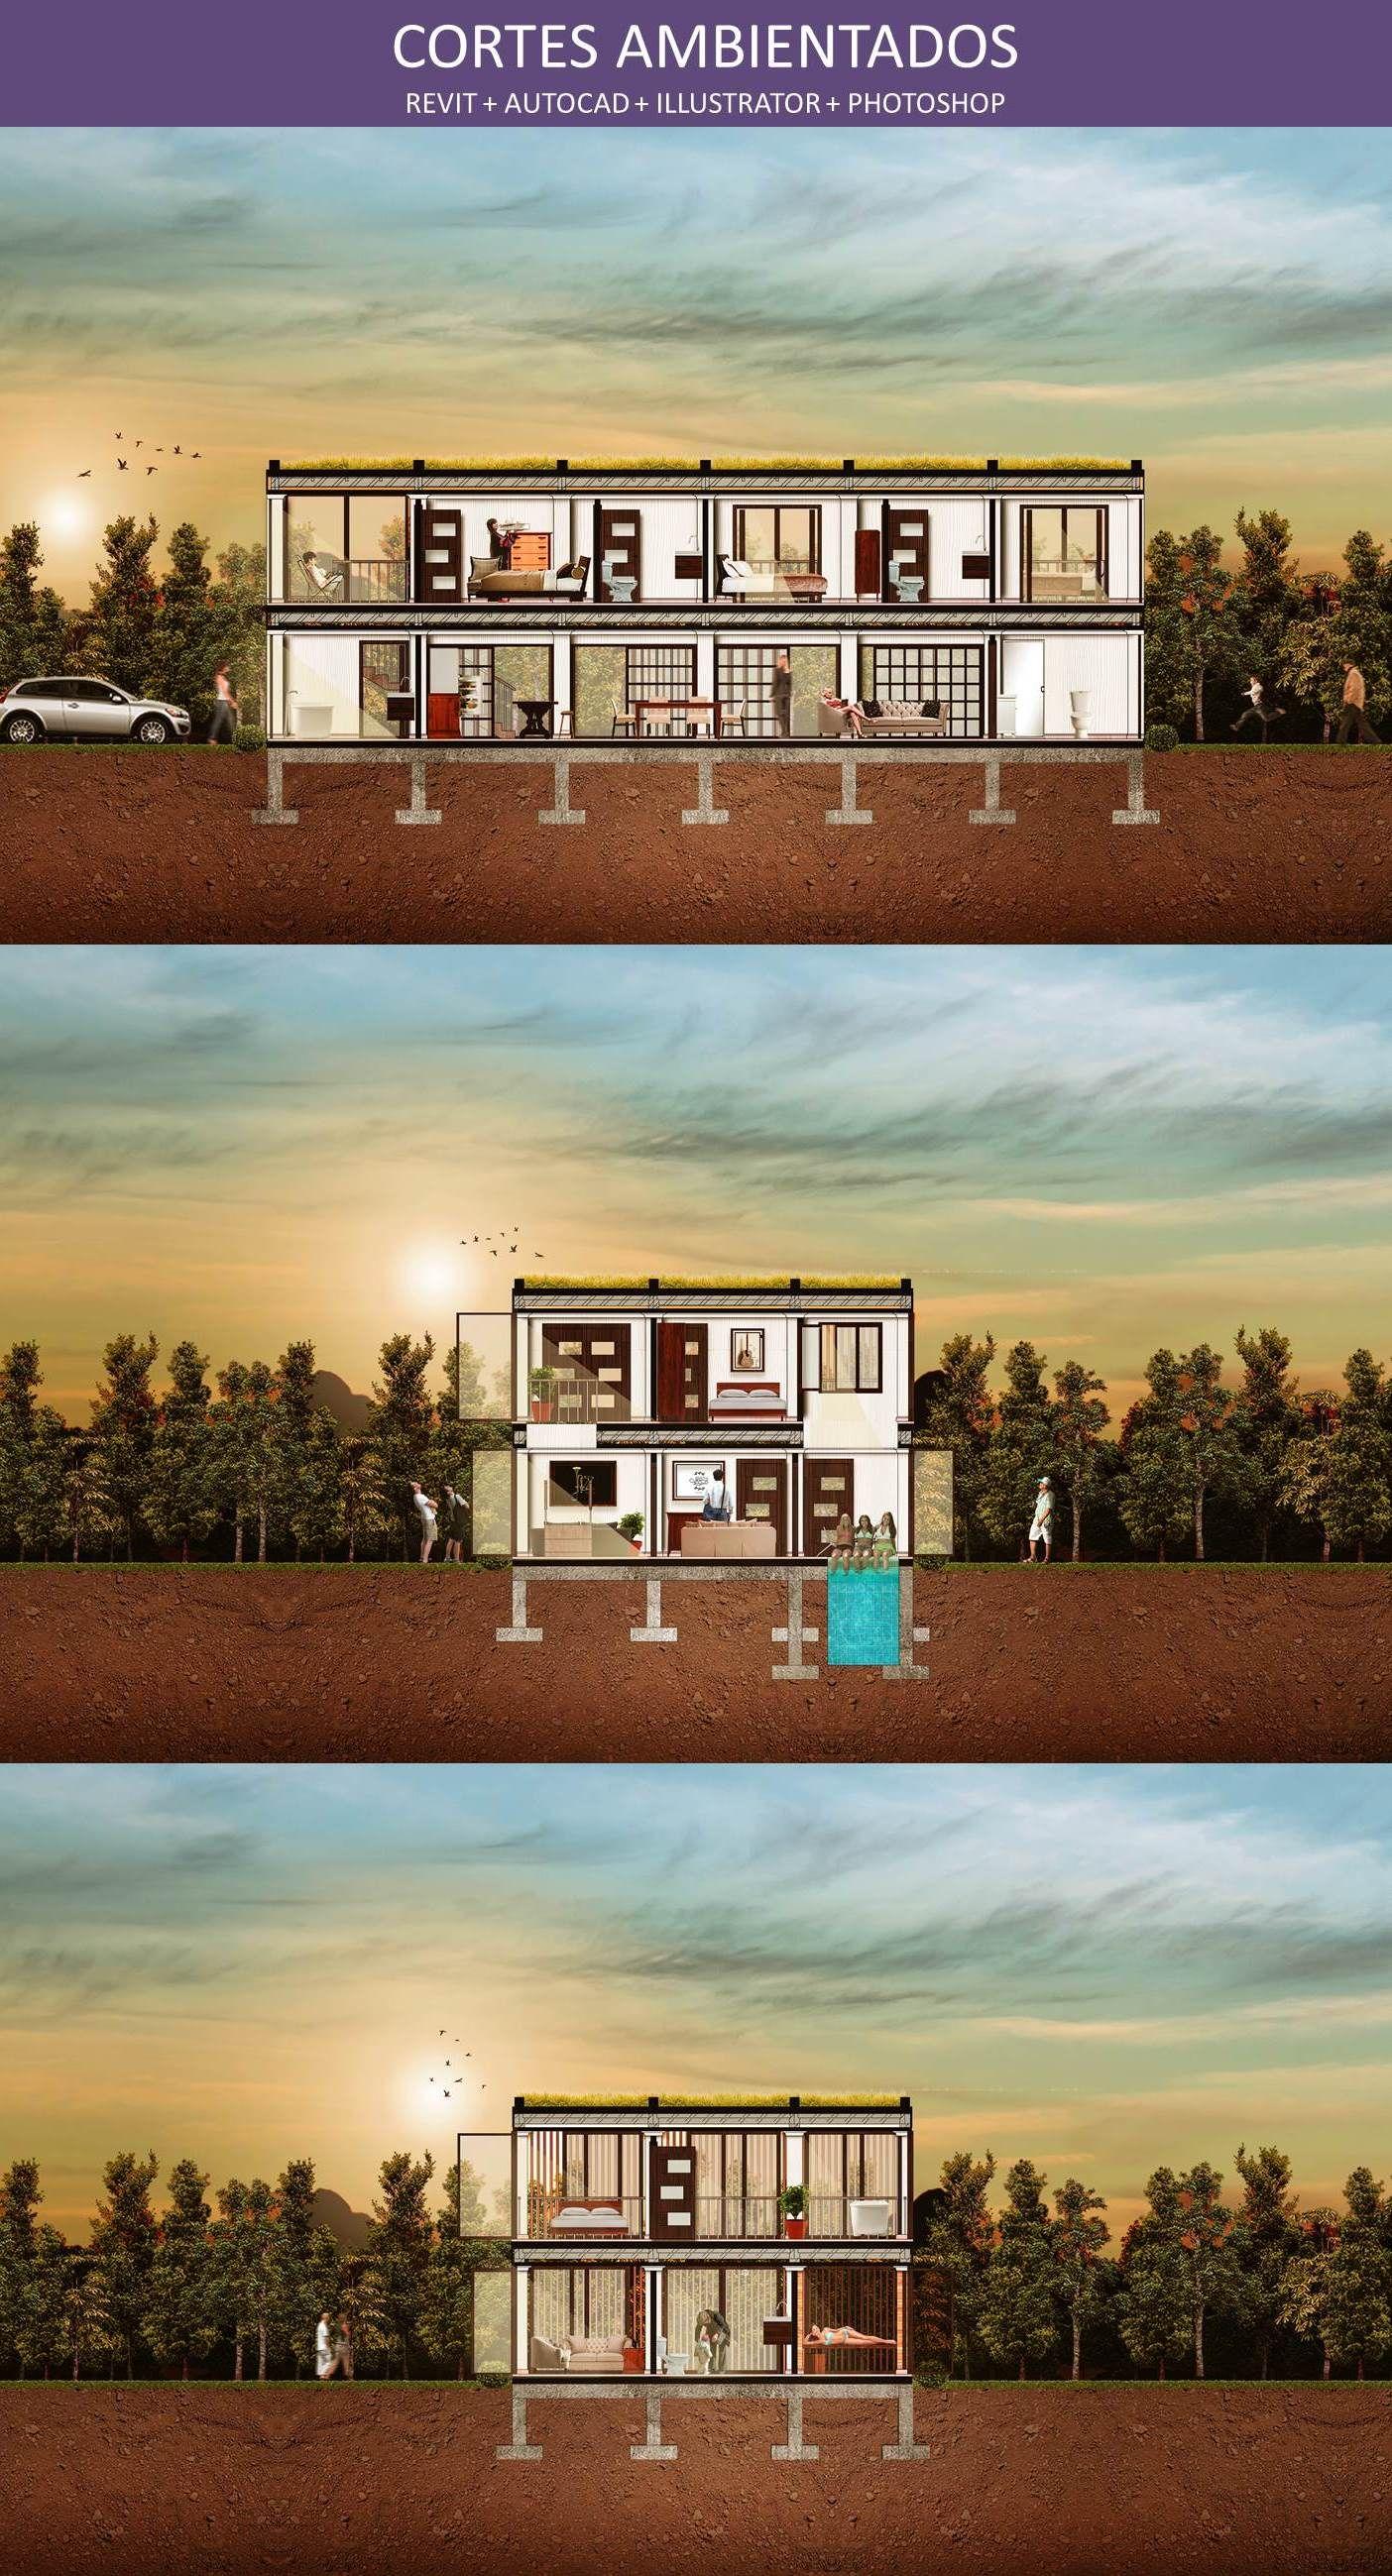 Cortes ambientados planos arquitect nicos revit for Cortes arquitectonicos